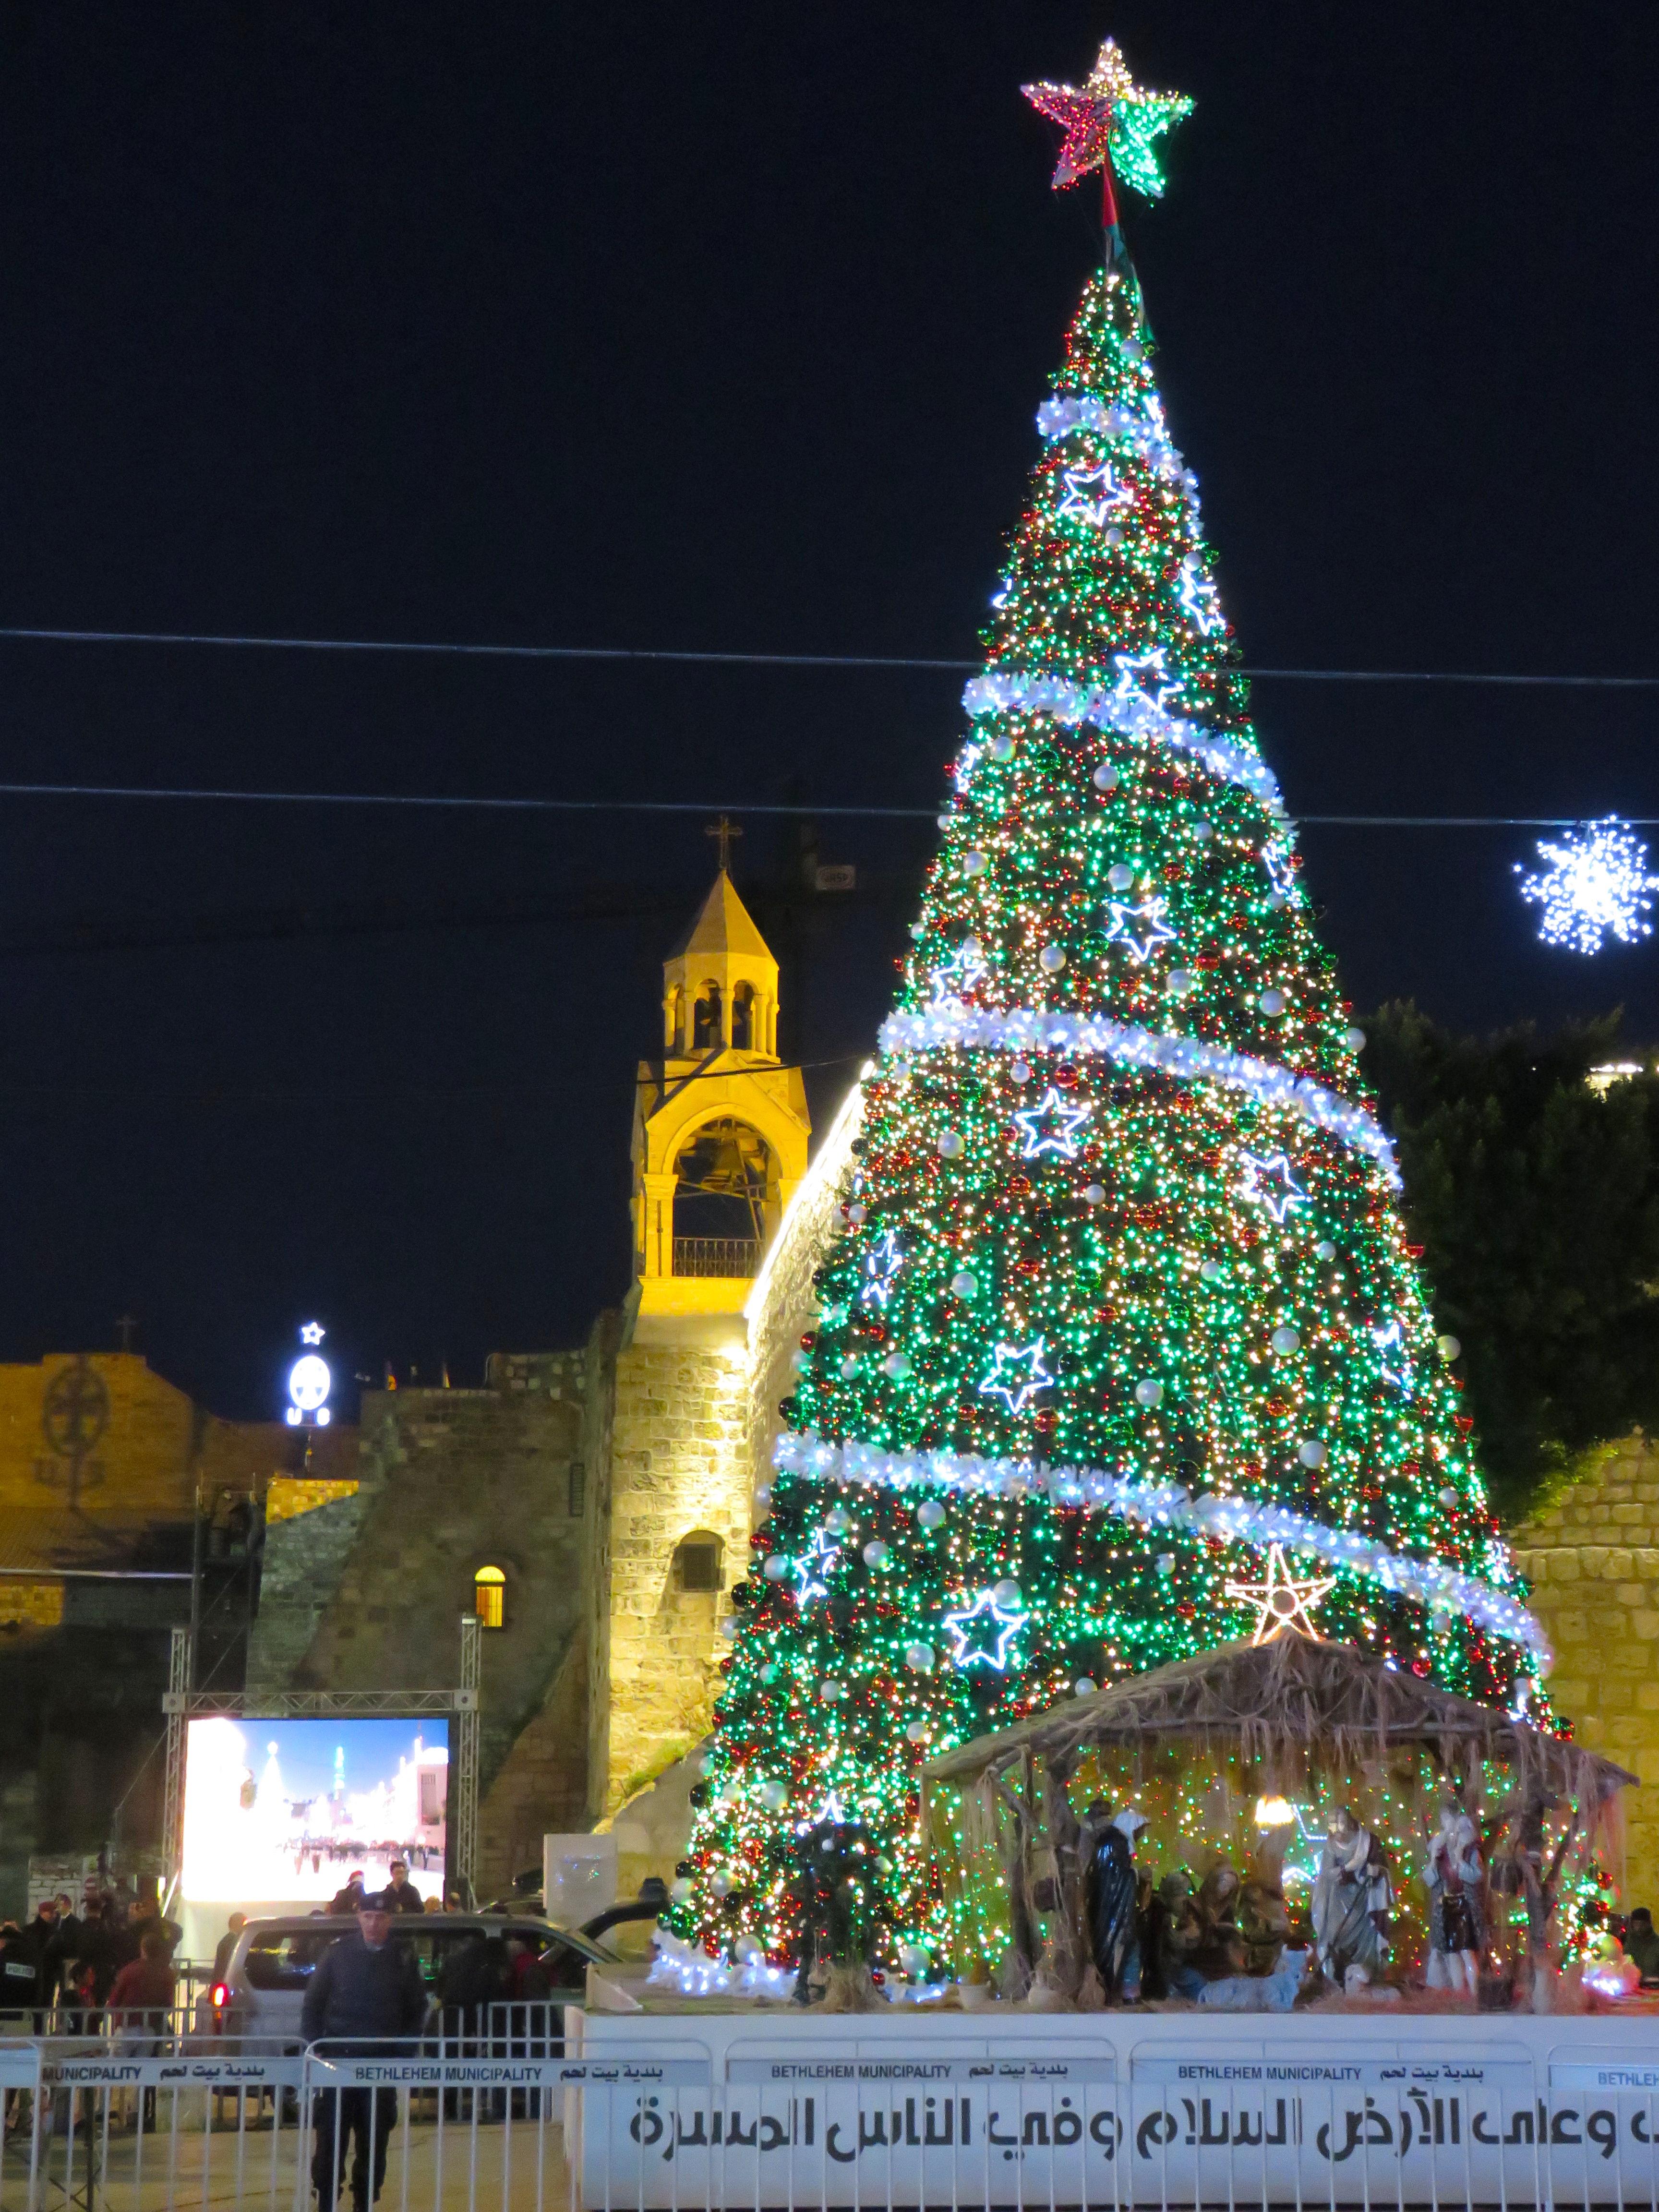 Bethlehem Christmas Tree And Church